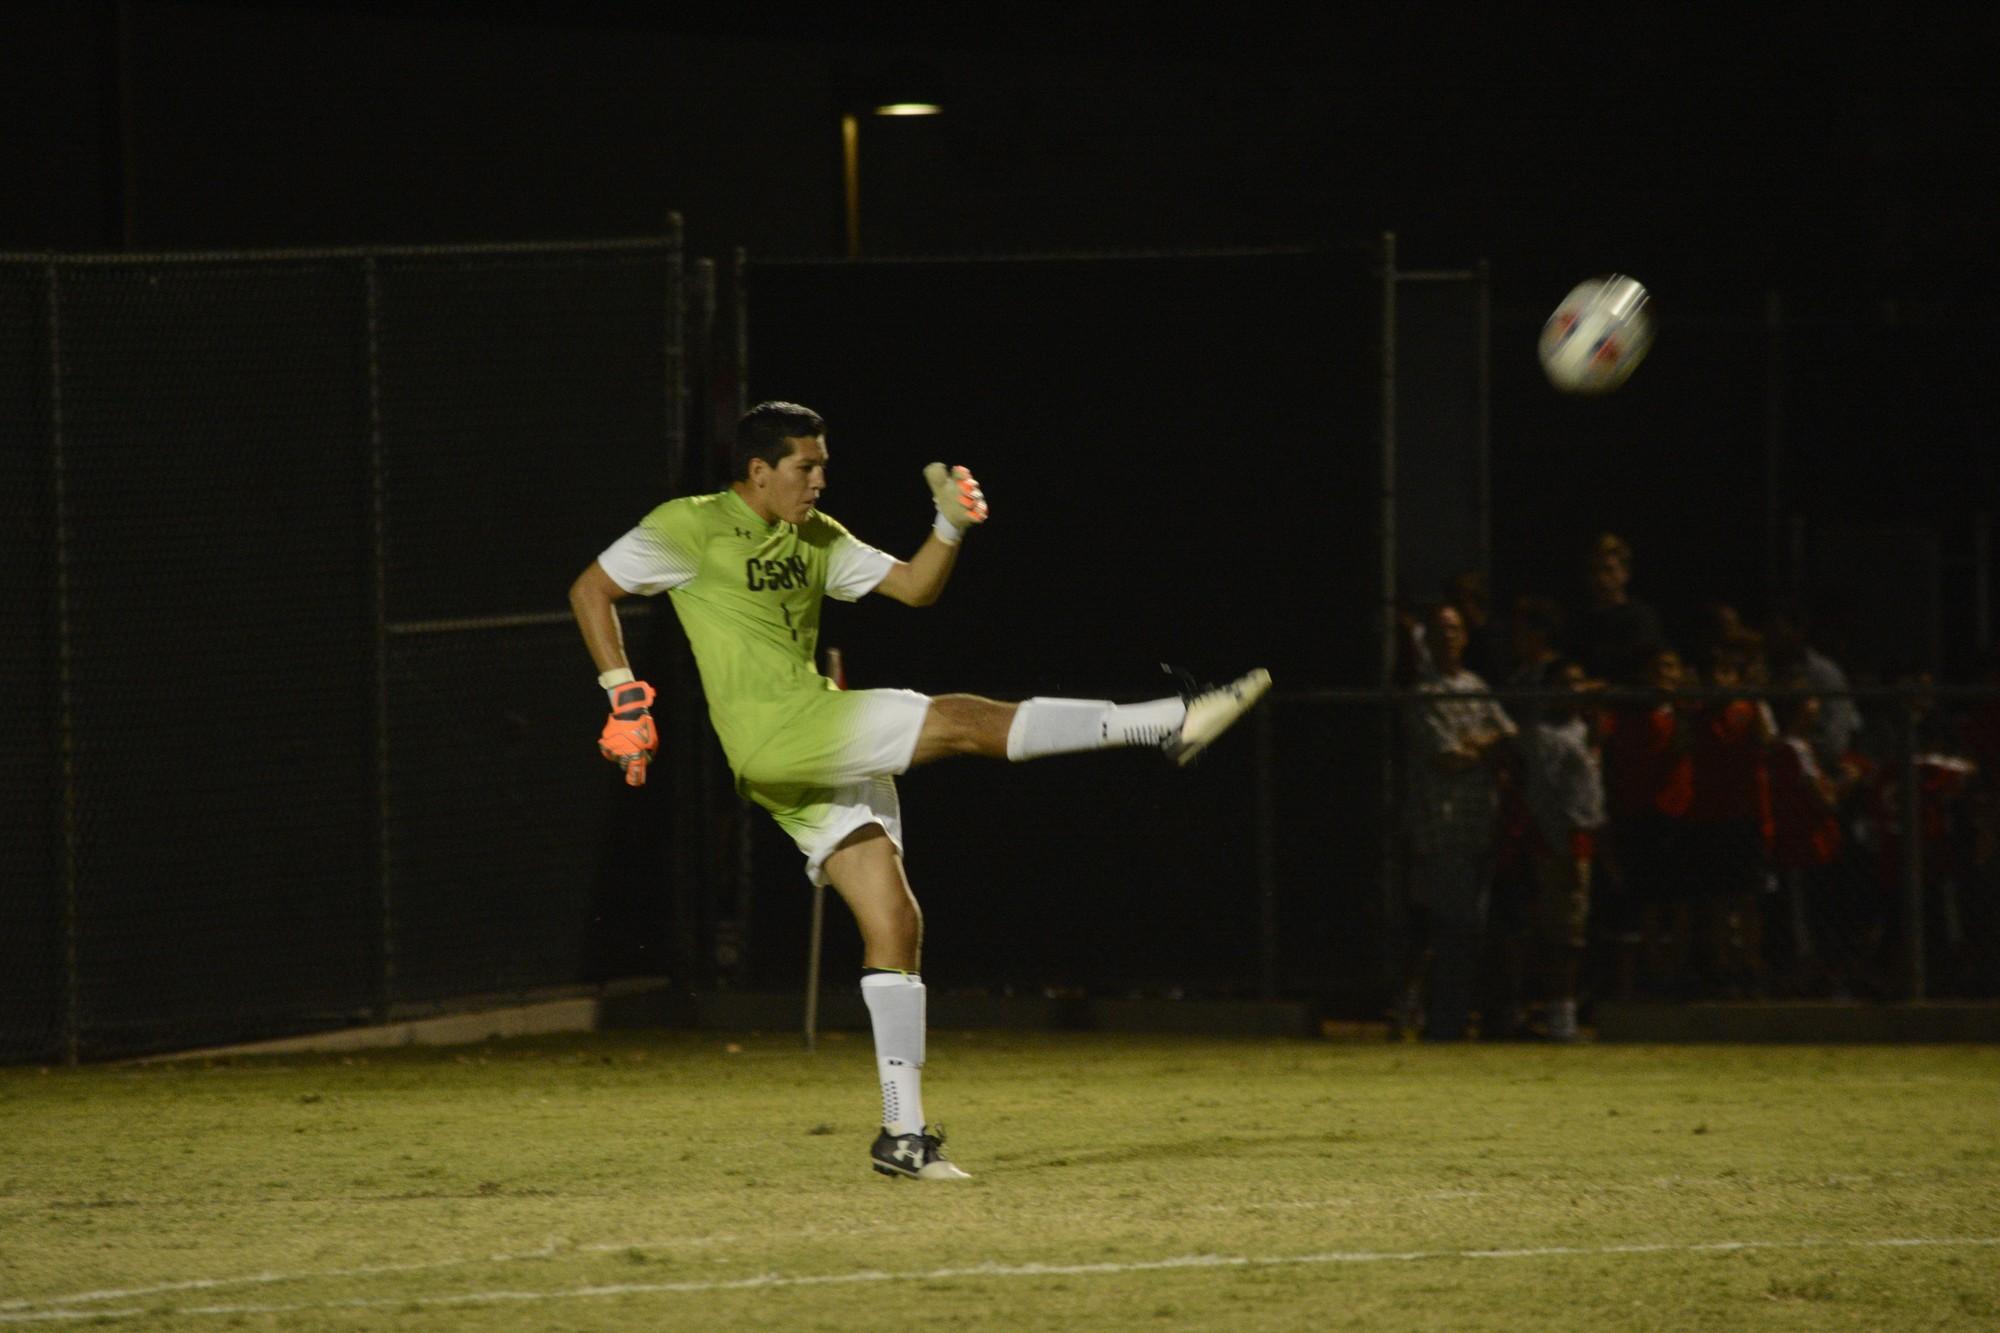 CSUN+goalie+kicks+the+ball+down+the+field